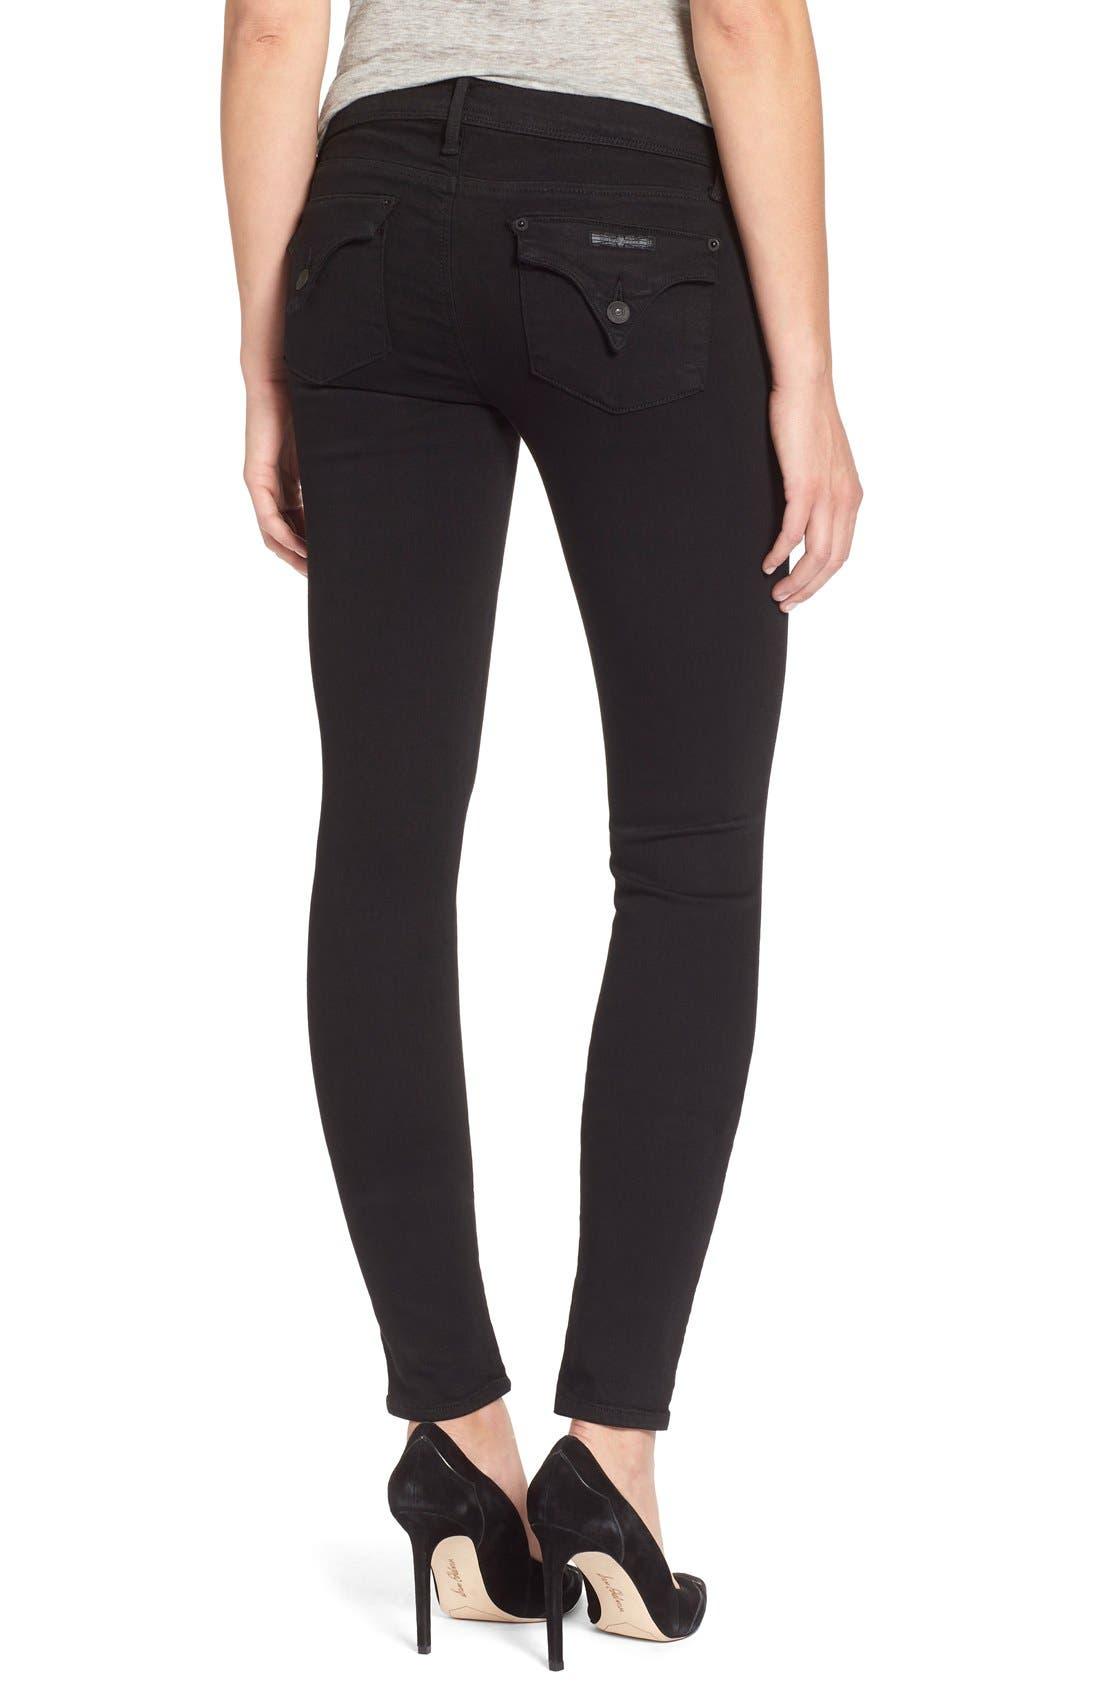 Alternate Image 2  - Hudson Jeans 'Collin' Supermodel Skinny Jeans (Black) (Long)